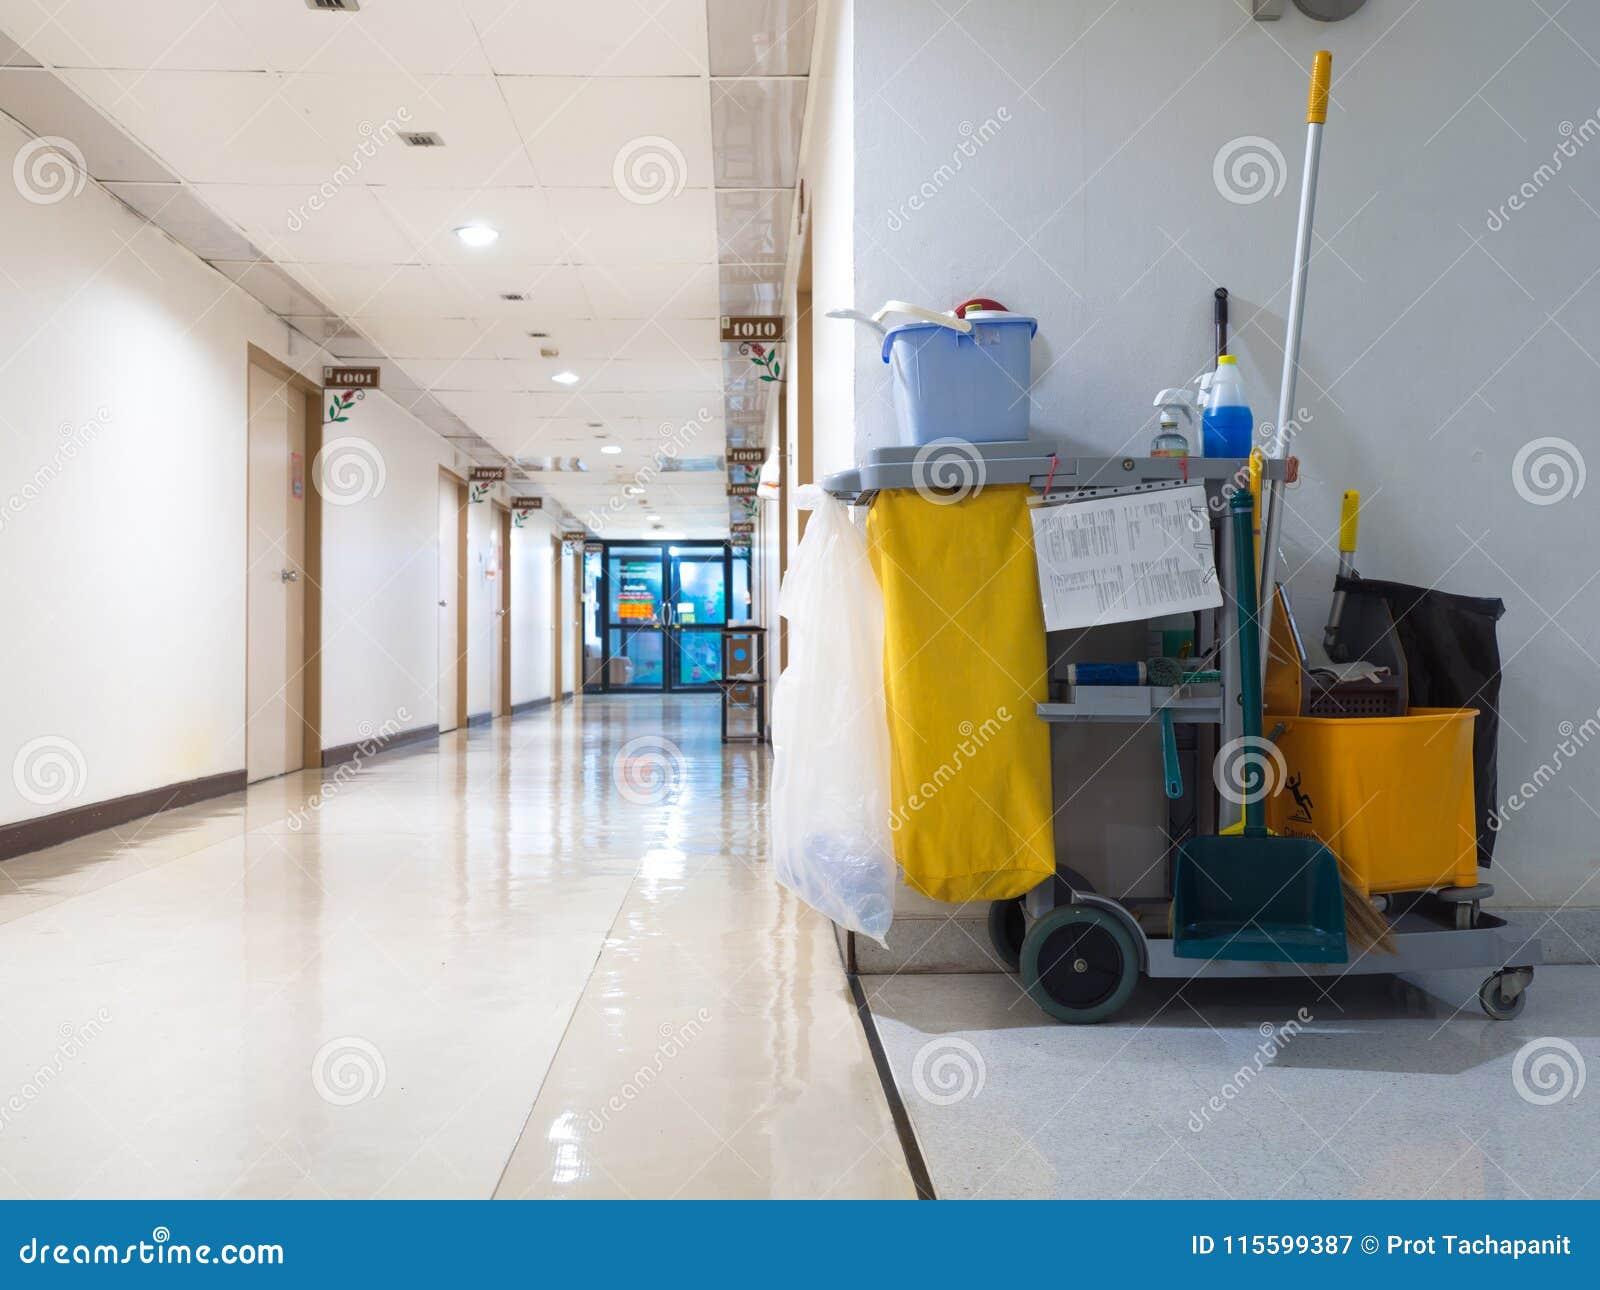 Espera do carro das ferramentas da limpeza para a empregada doméstica ou o líquido de limpeza no hospital Cubeta e grupo de equip